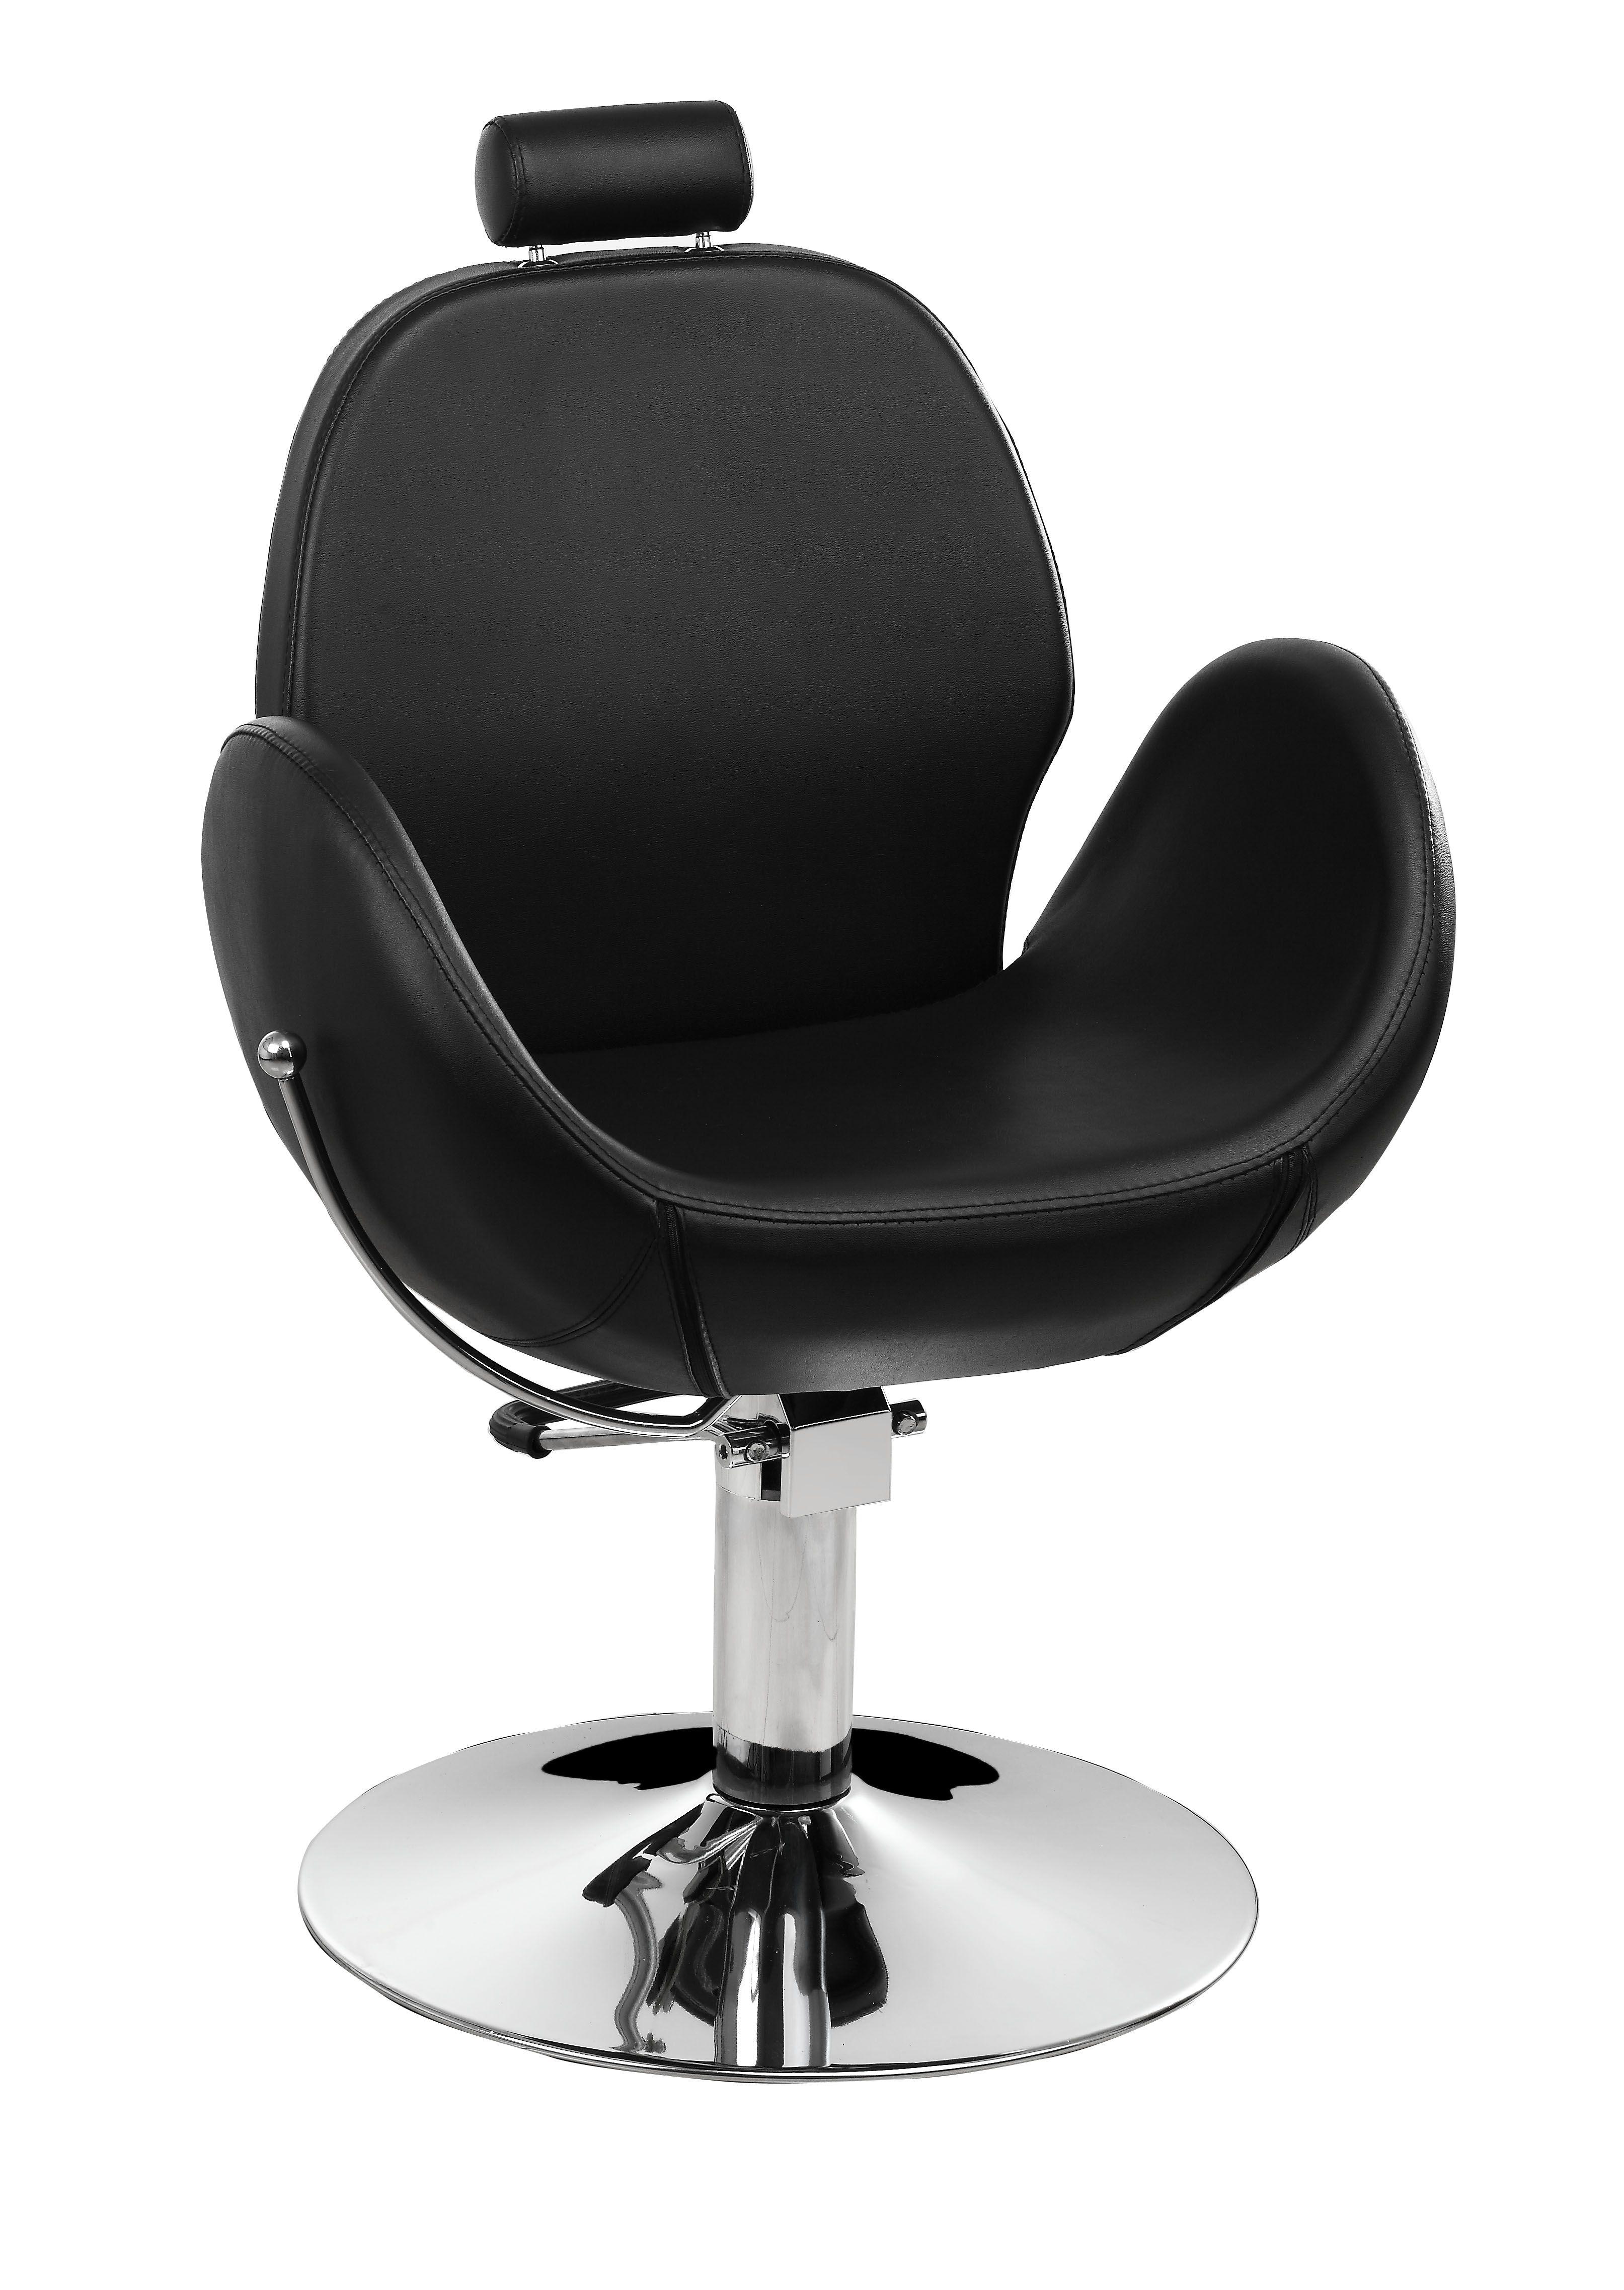 Awesome Hair Cutting Chair Rtty1 Com Rtty1 Com